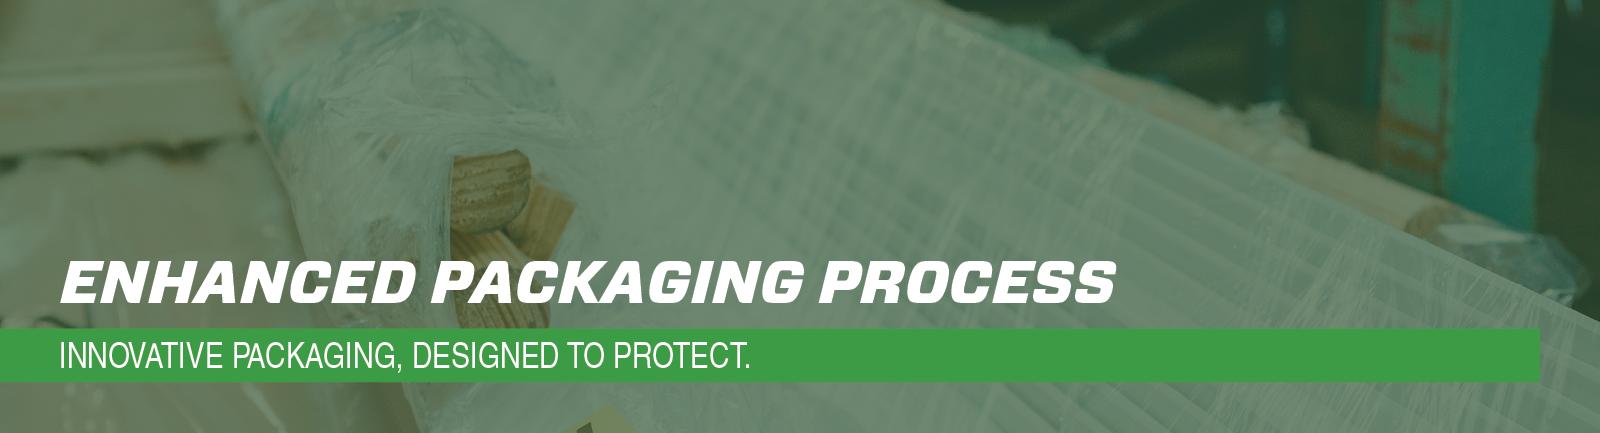 Enhanced Packaging Process